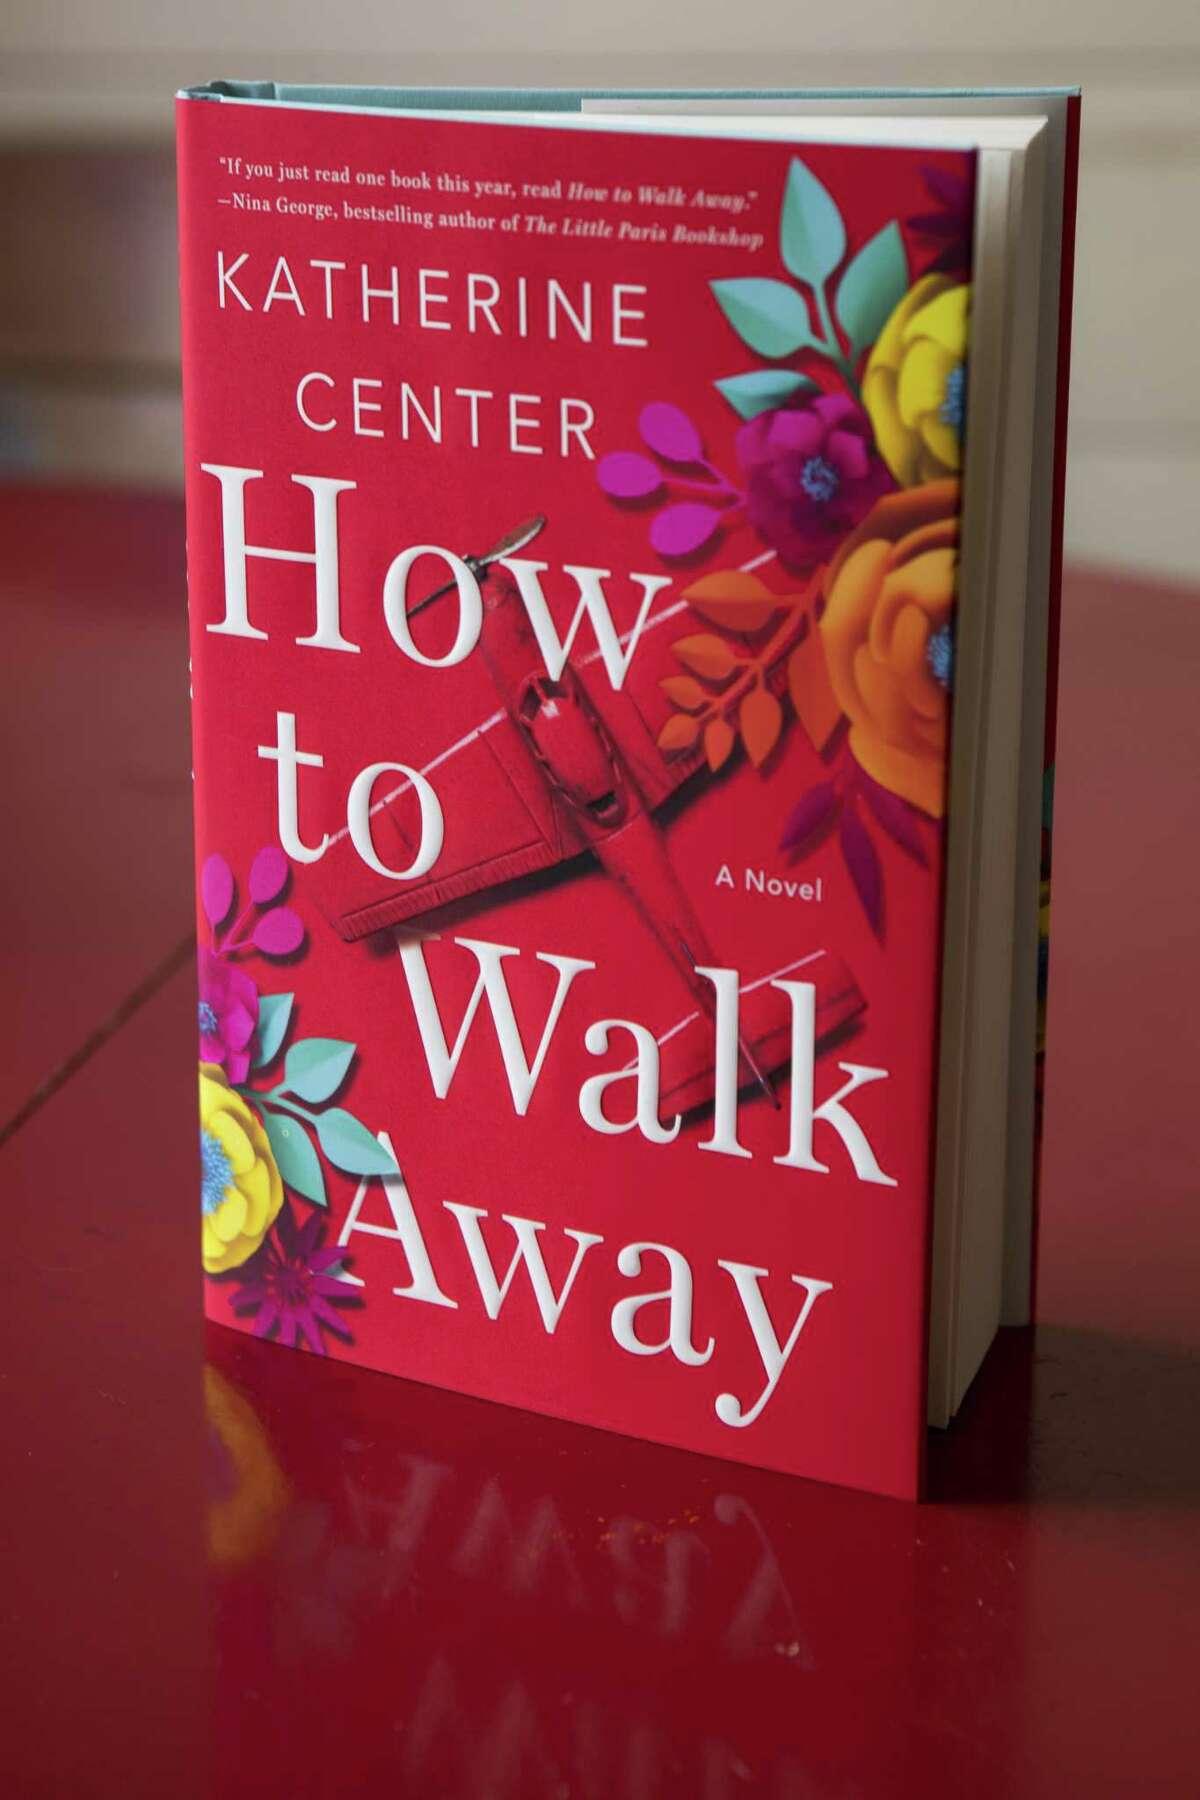 Katherine Center's latest novel,